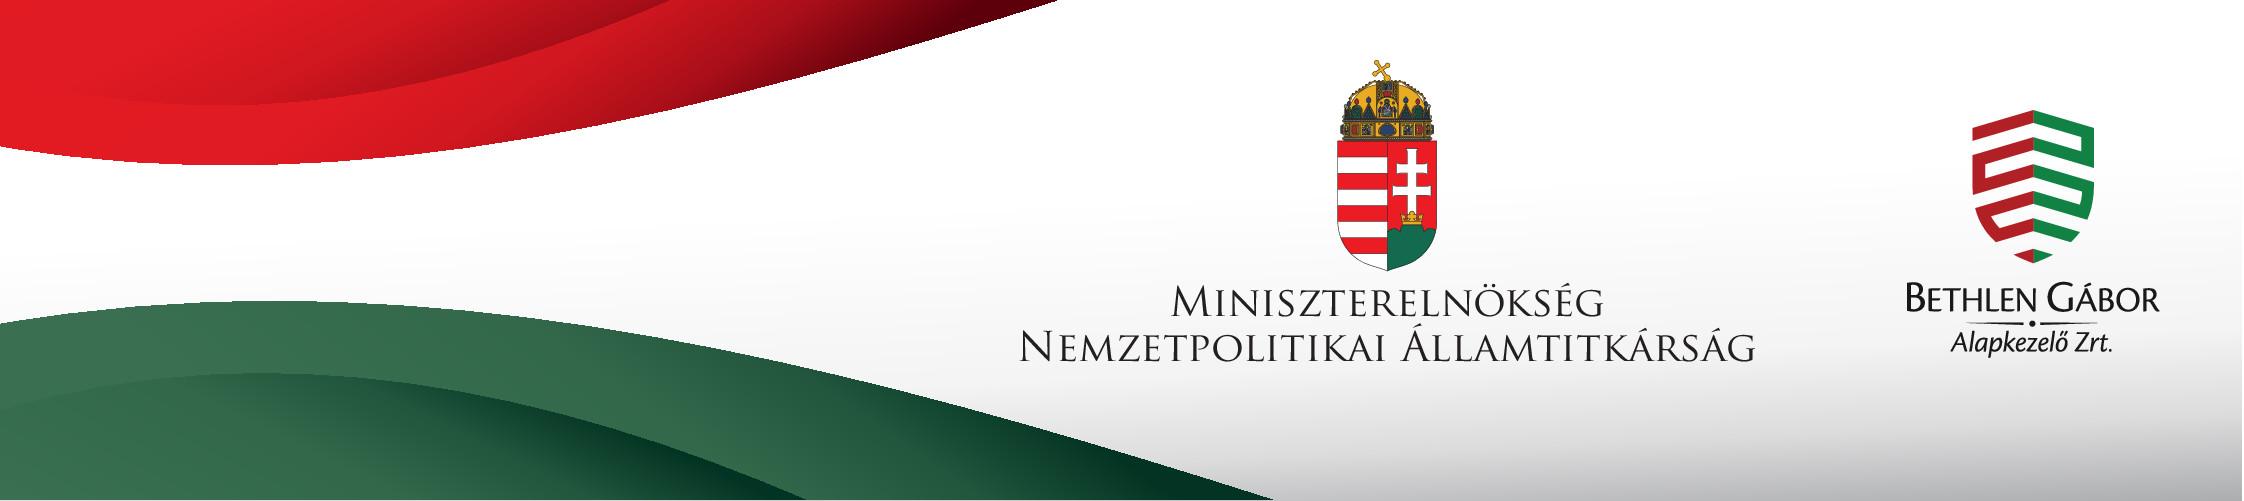 Hataron_tuli_magyar_kormany_altalanos